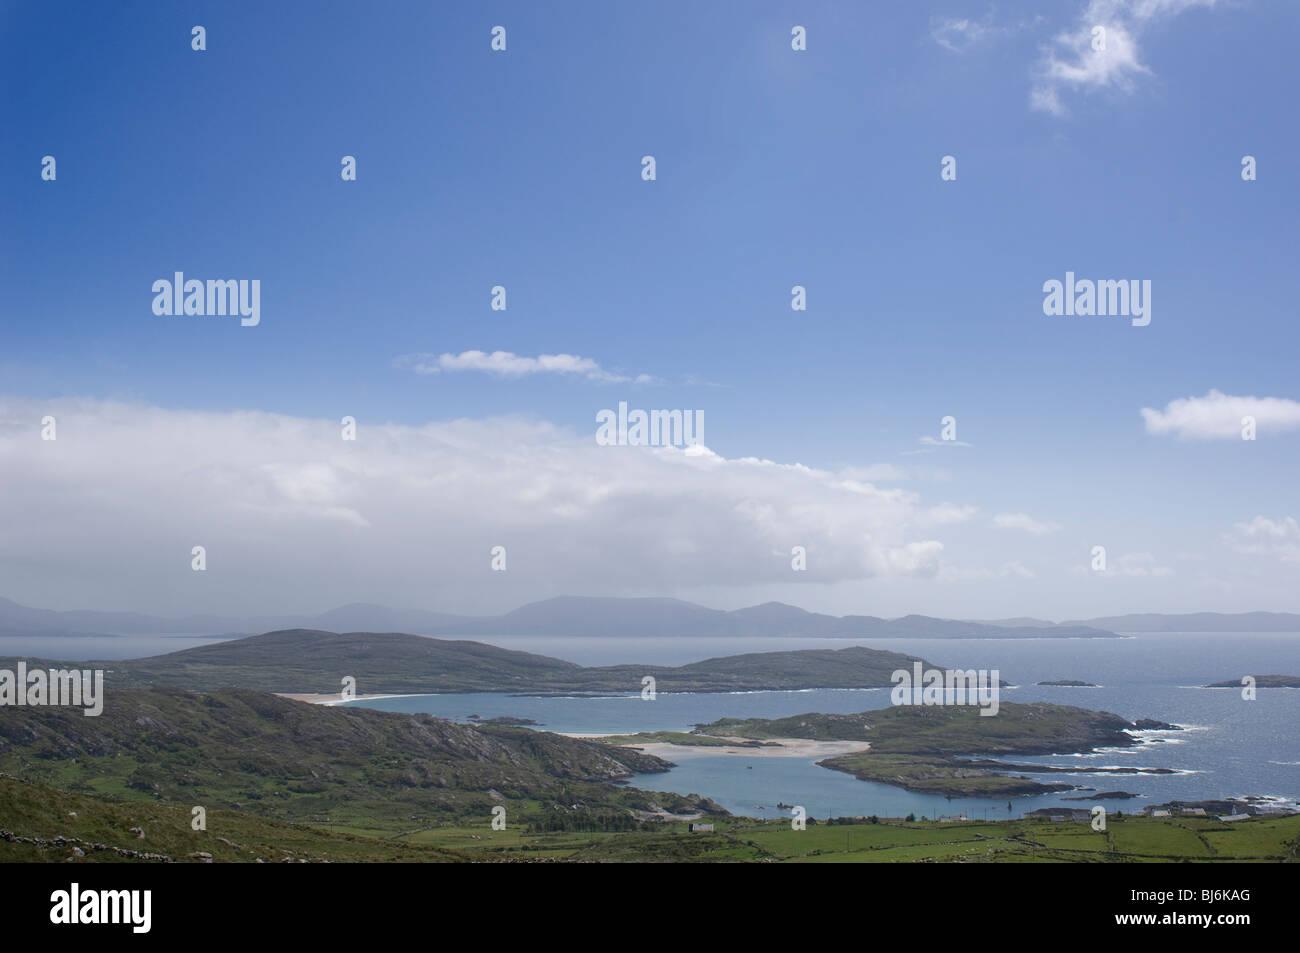 Irish Landscape - John Gollop - Stock Image